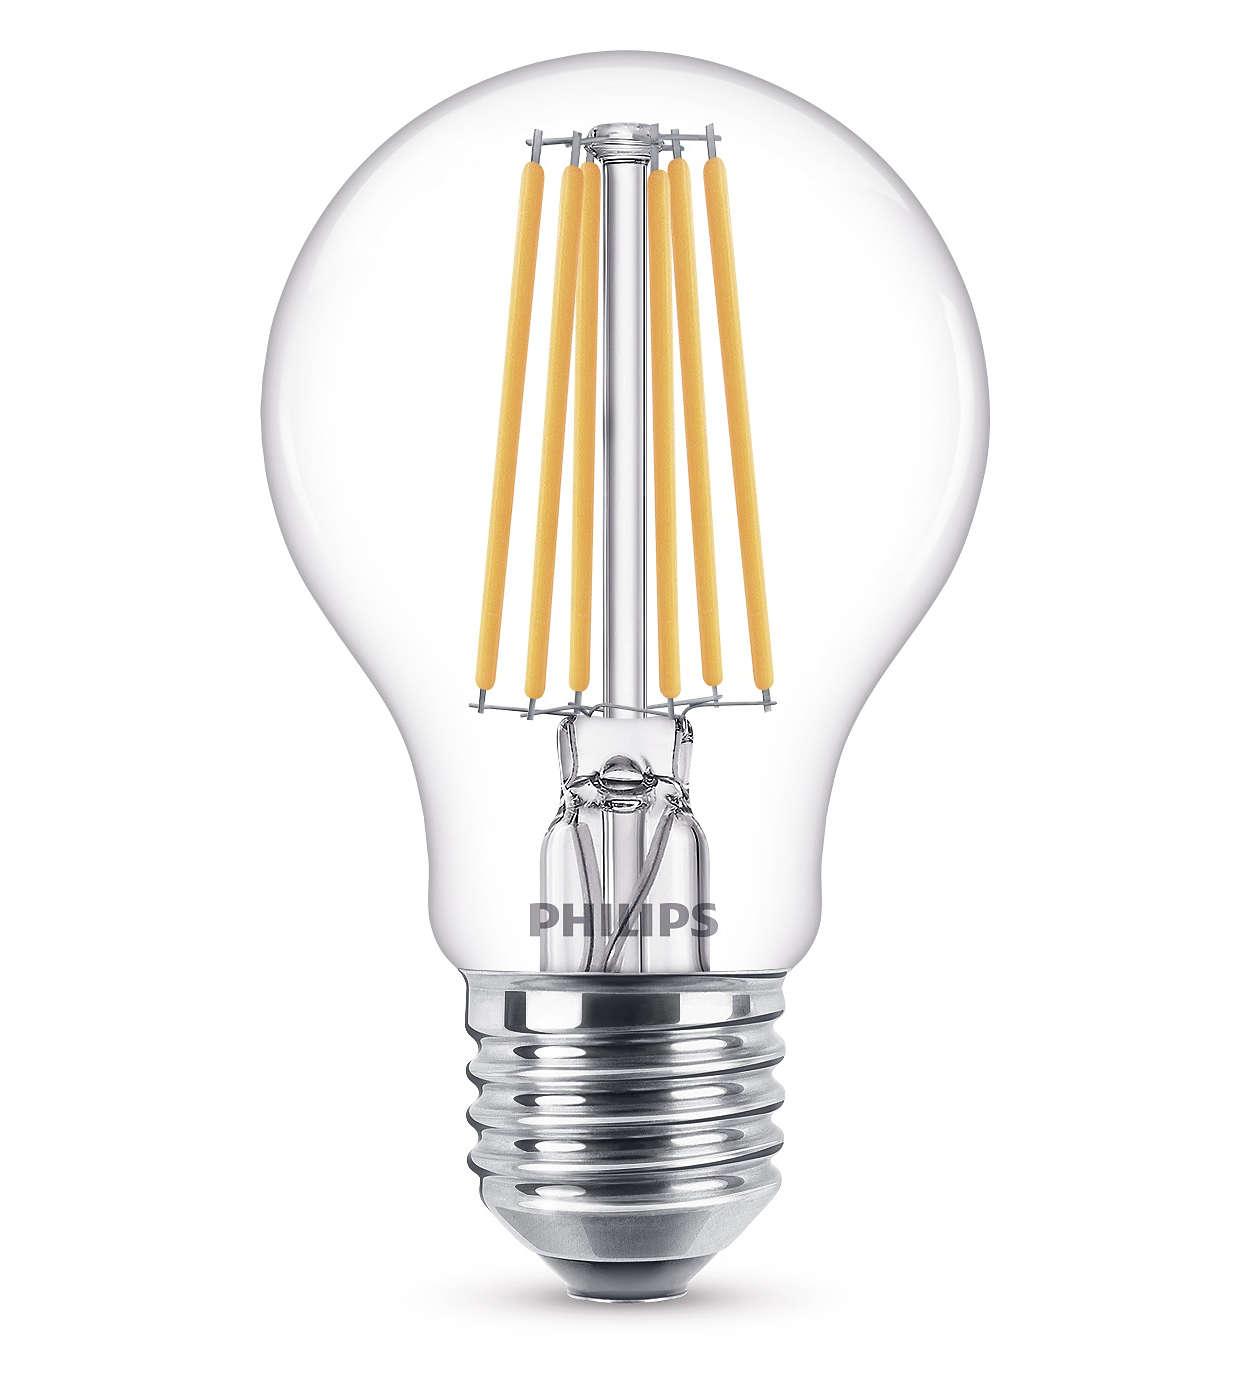 LED Lampe (dimmbar) 8718696709320 | Philips